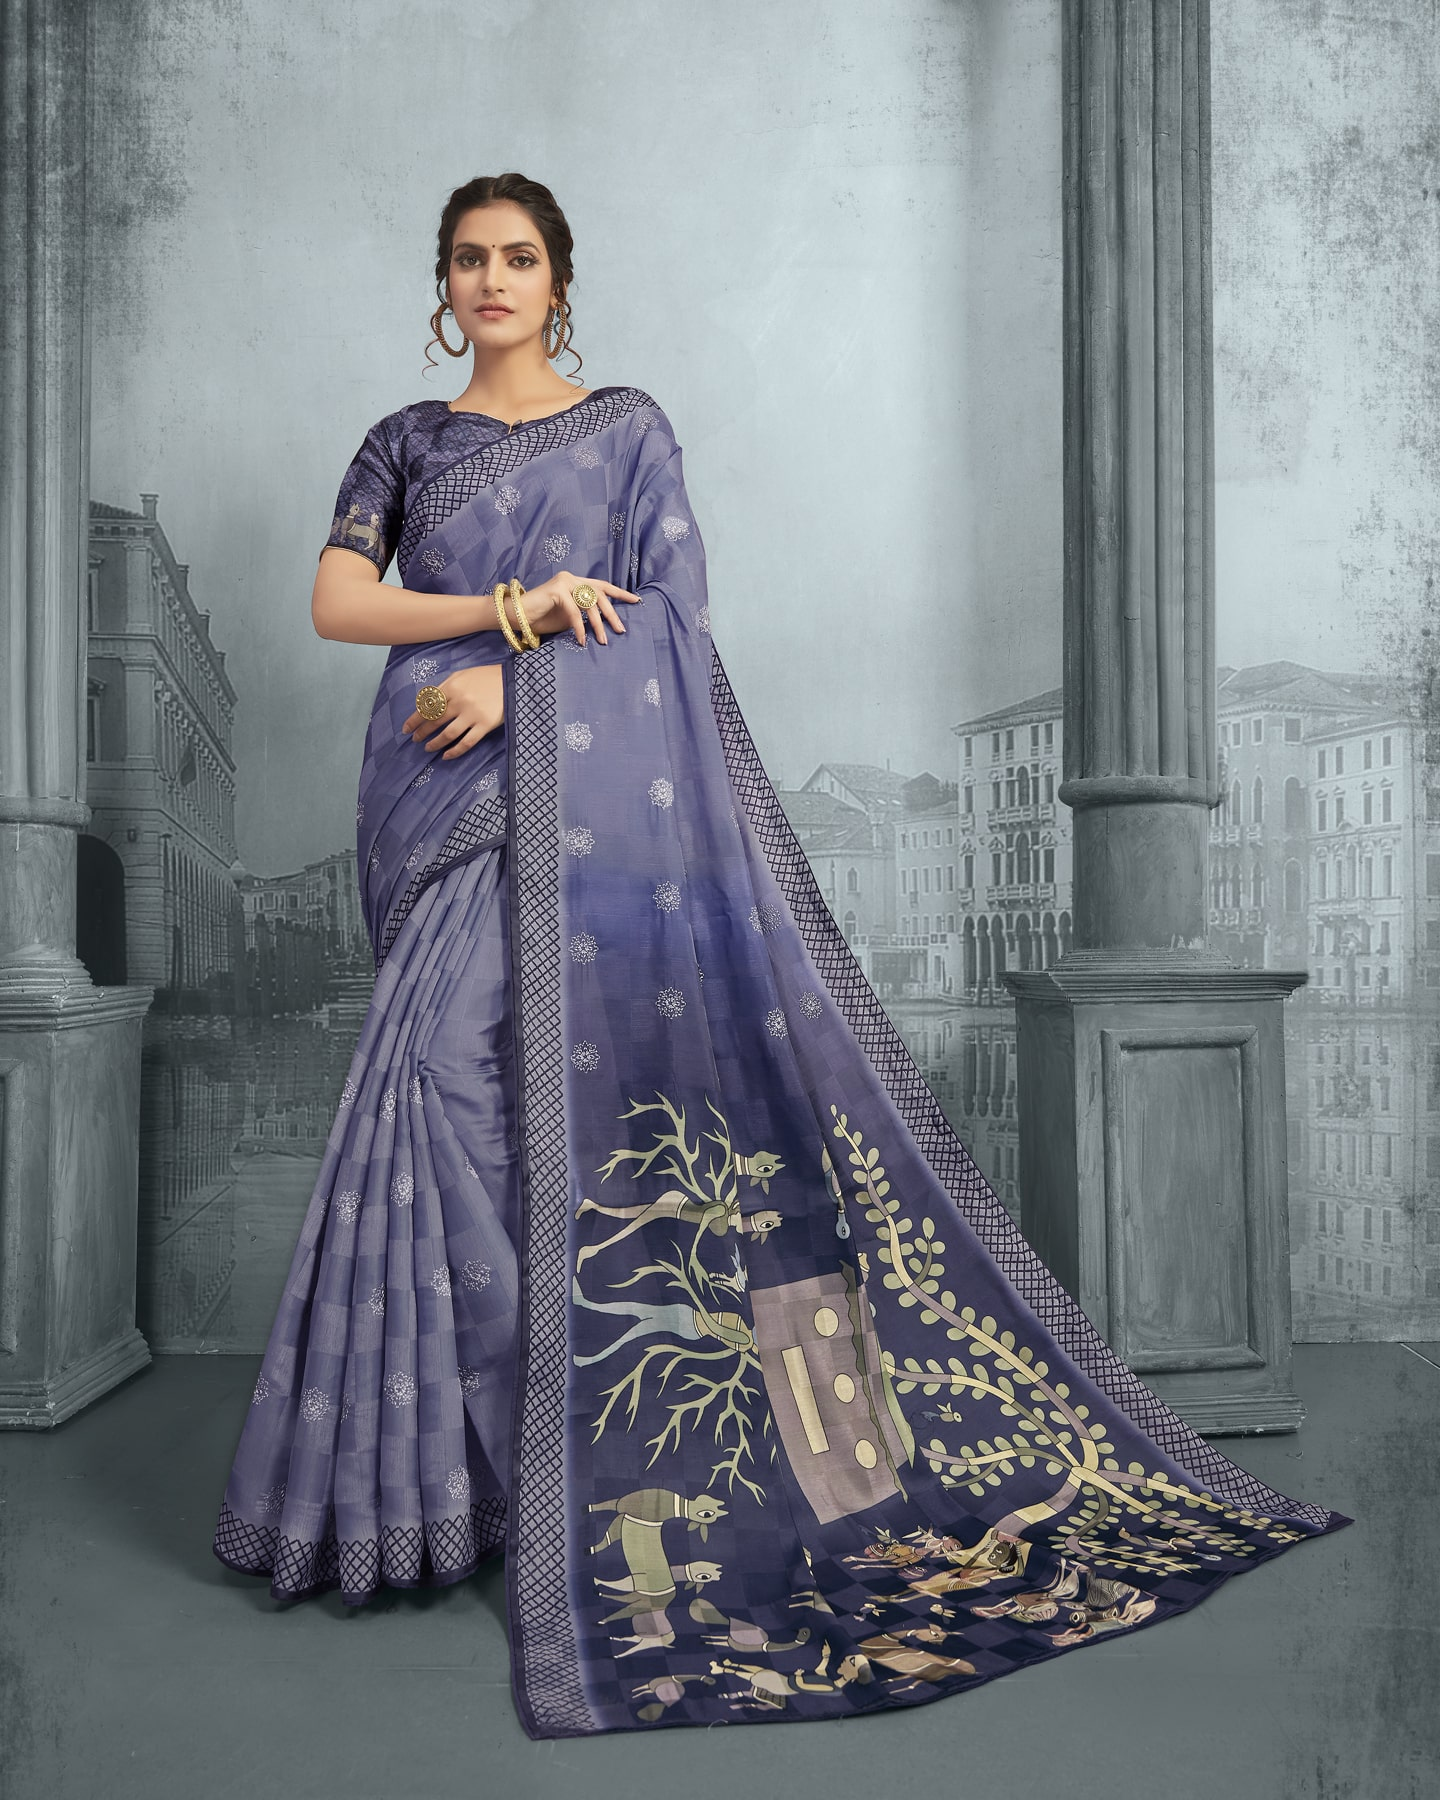 Embroidered Kalamkari Printed Saree